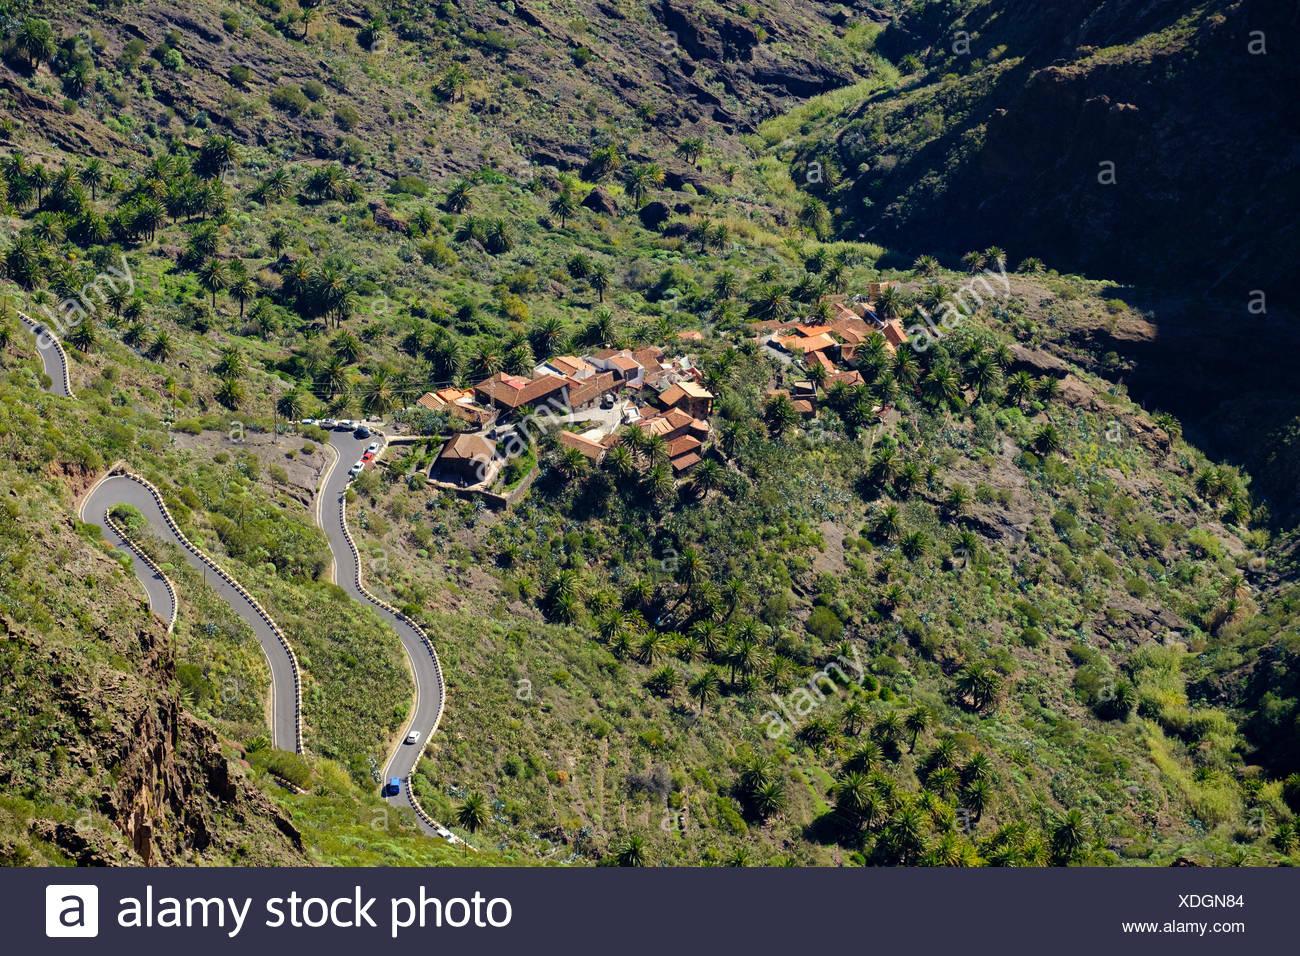 Dorf Masca, Masca-Schlucht, Teno-Gebirge, Parque Rural de Teno, Teneriffa, Kanarische Inseln, Spanien Stockbild